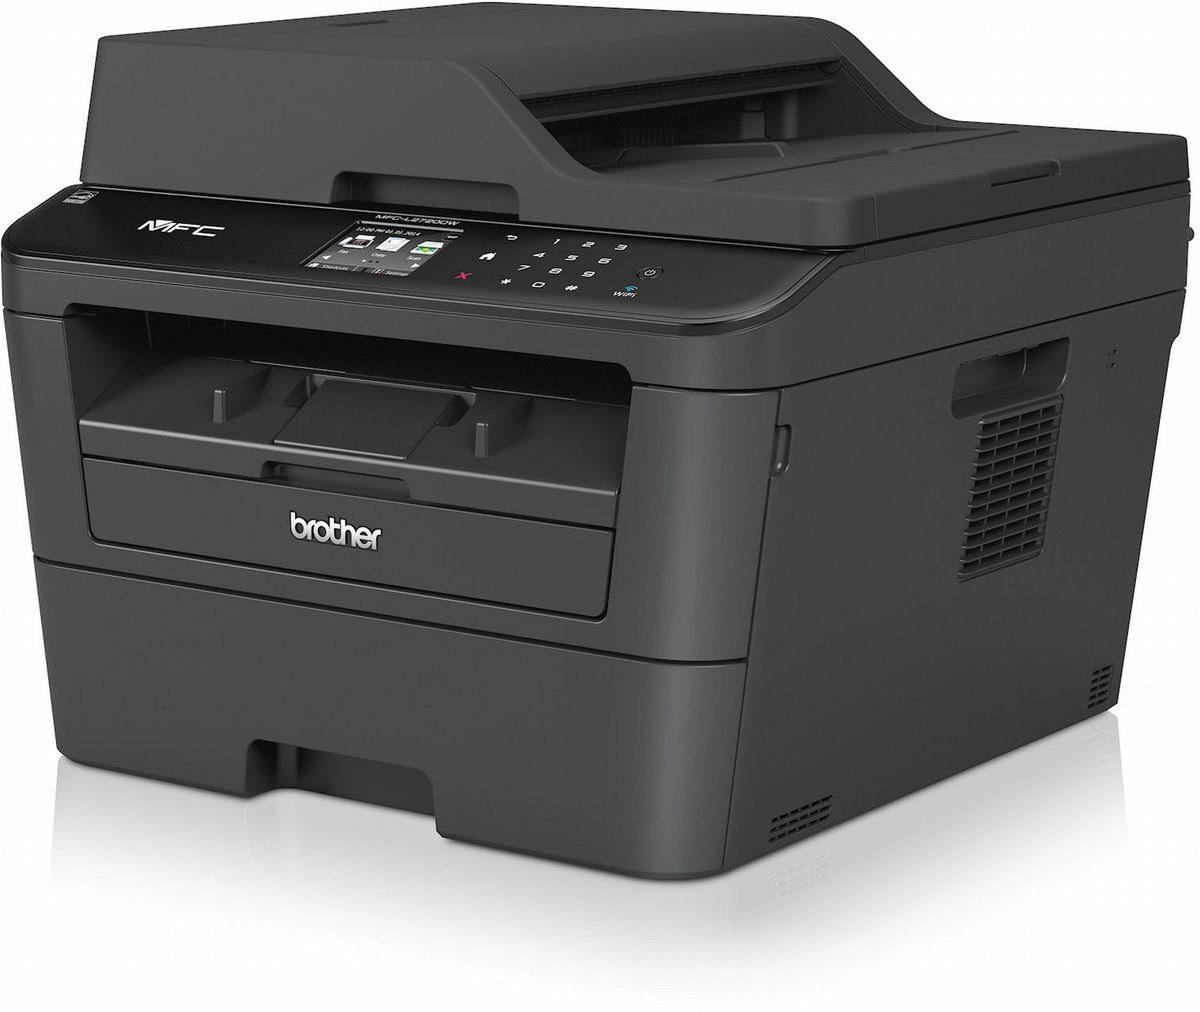 Brother Monolaser-Multifunktionsdrucker »MFC-L2720DW 4in1 Multifunktionsdrucker«